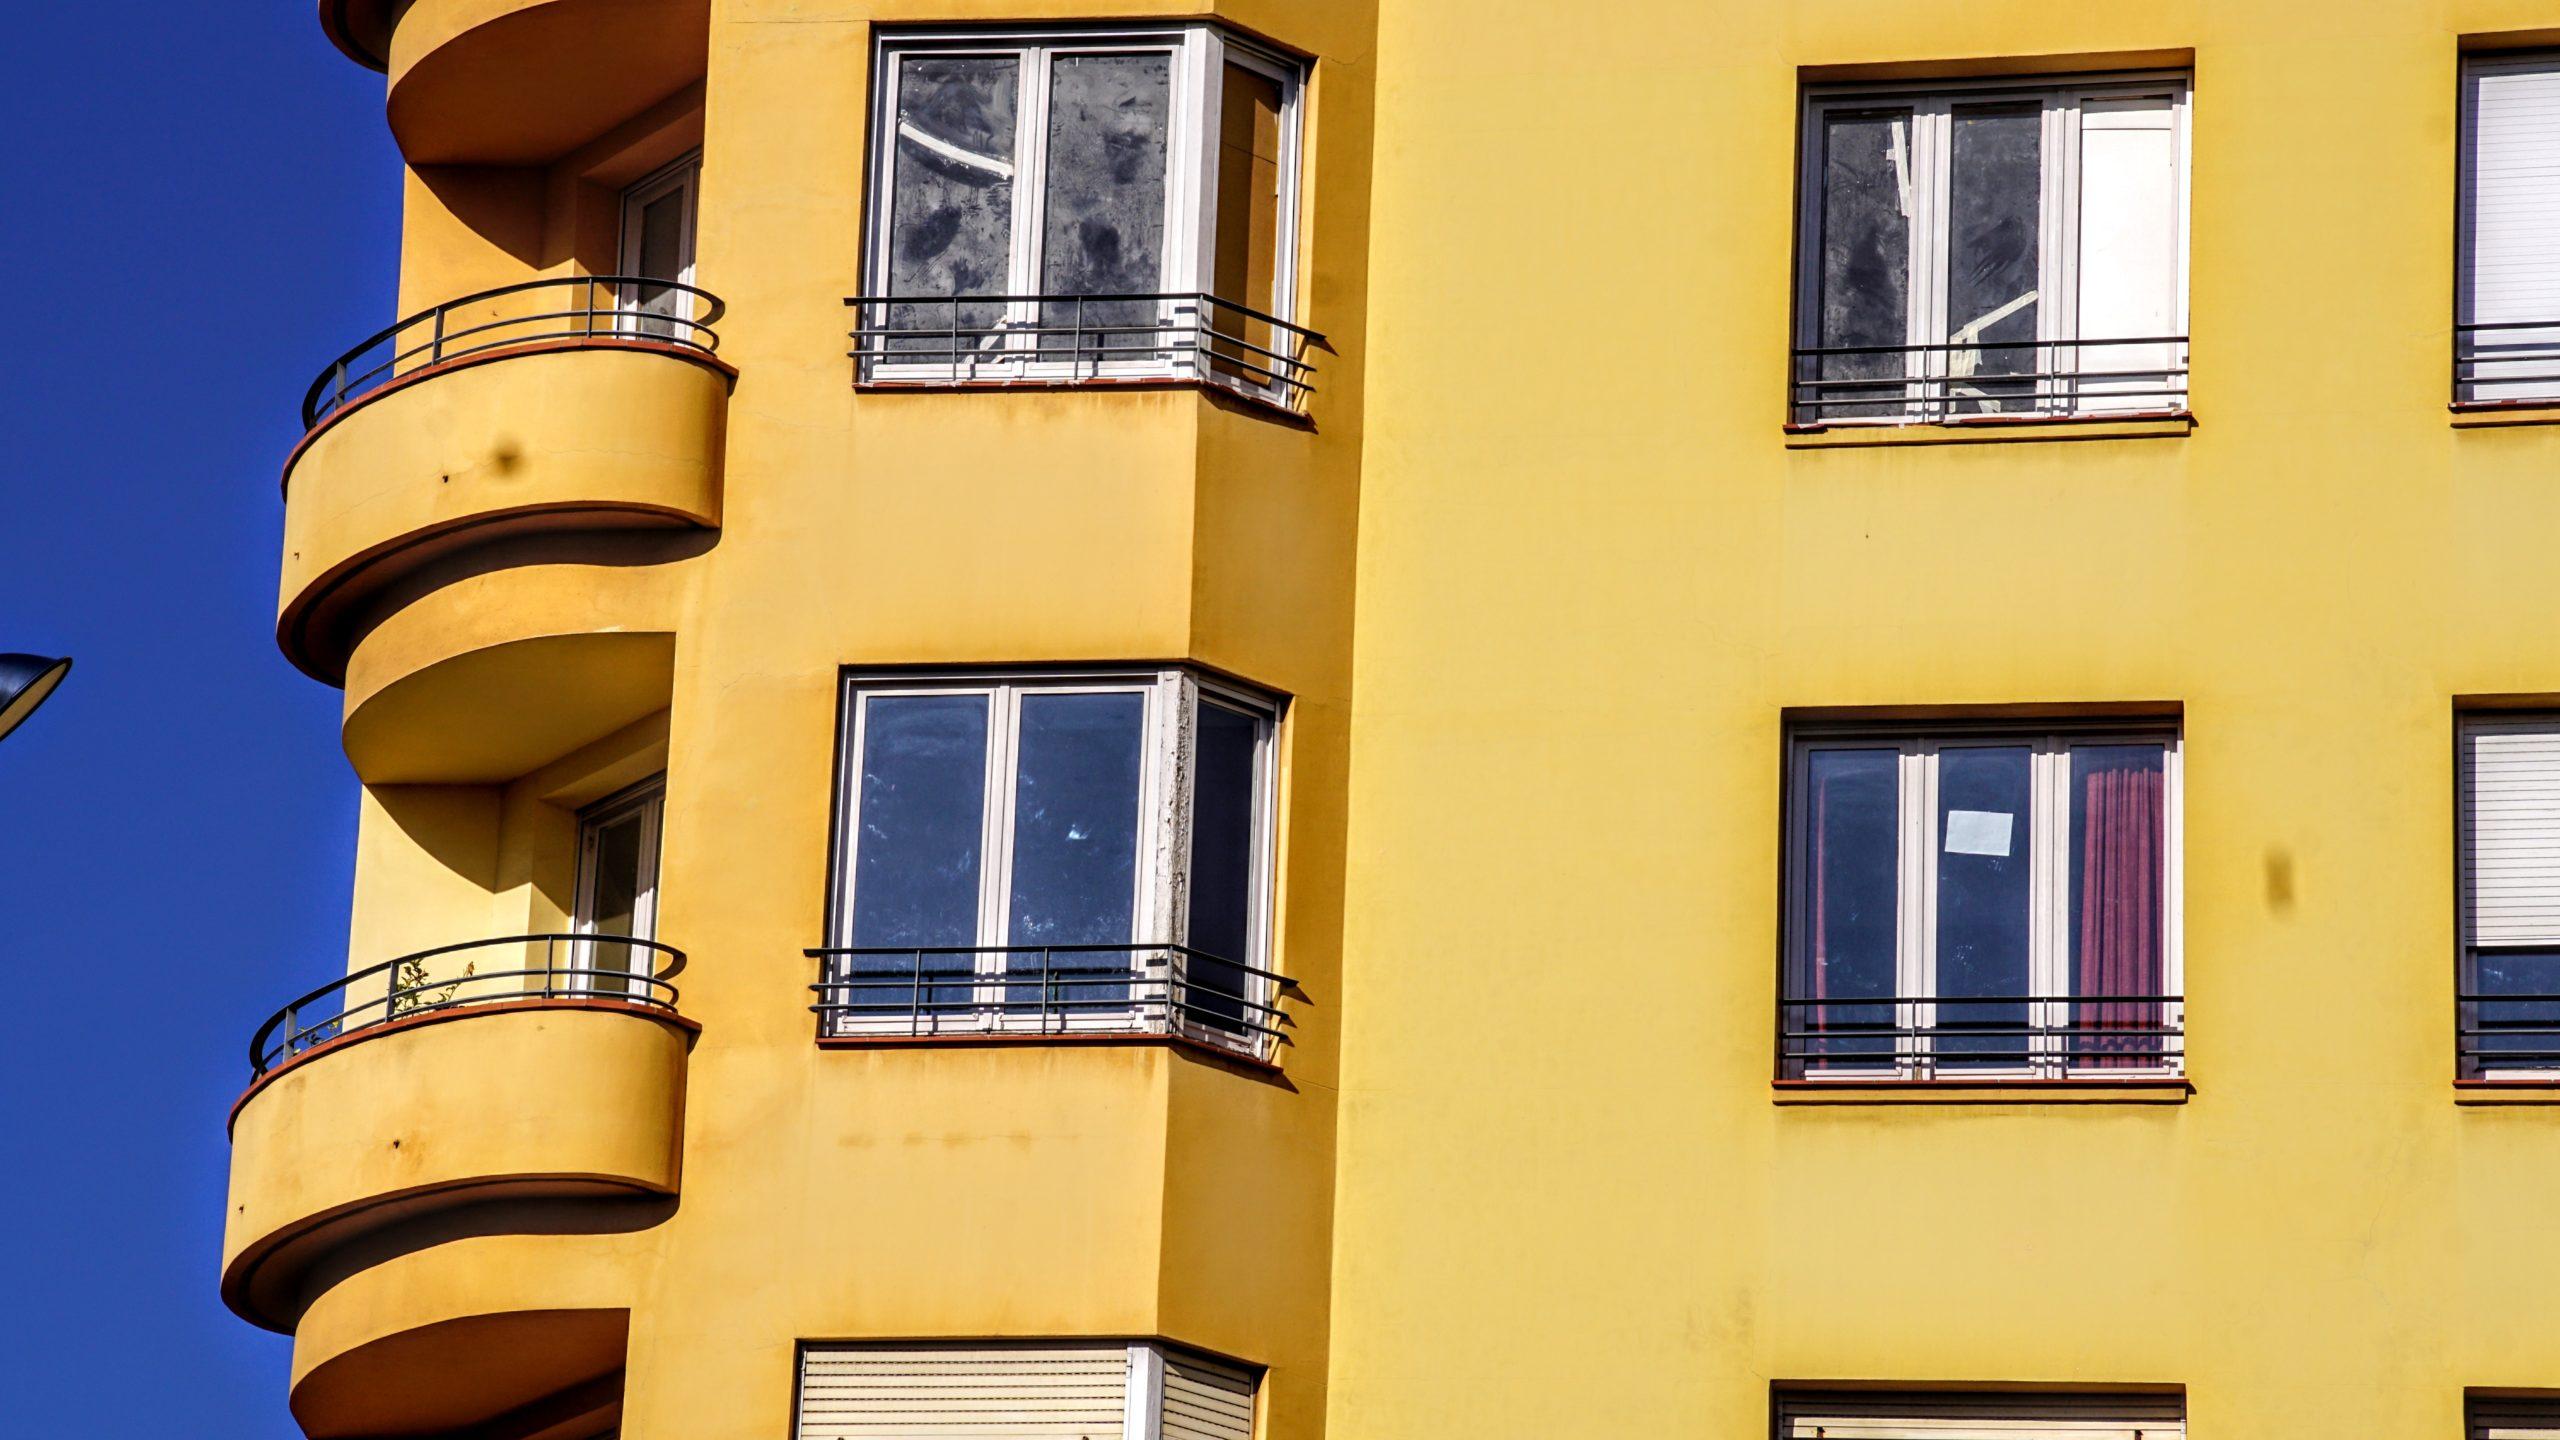 La Barcelona del GATCPAC. Itinerari per l'arquitectura d'avantguarda